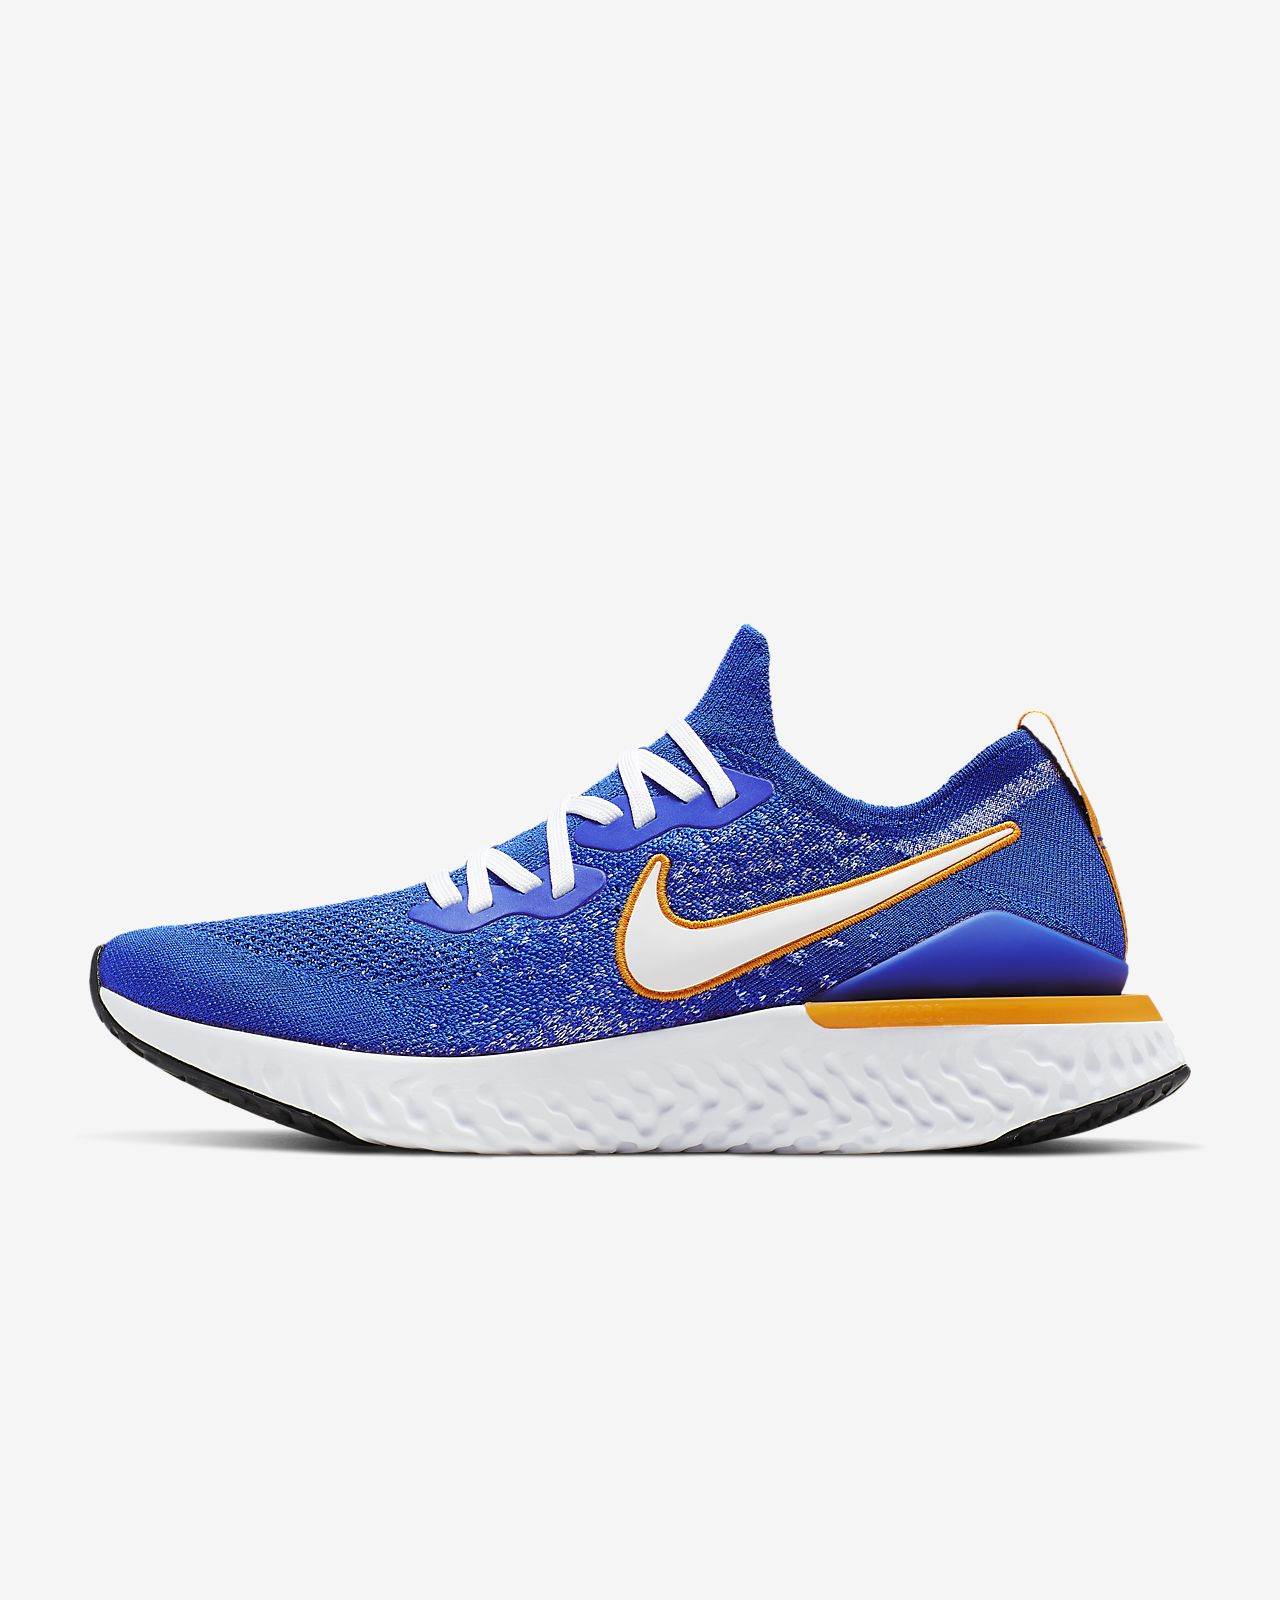 official photos fef82 0a5a7 Nike Epic React Flyknit 2 Men's Running Shoe